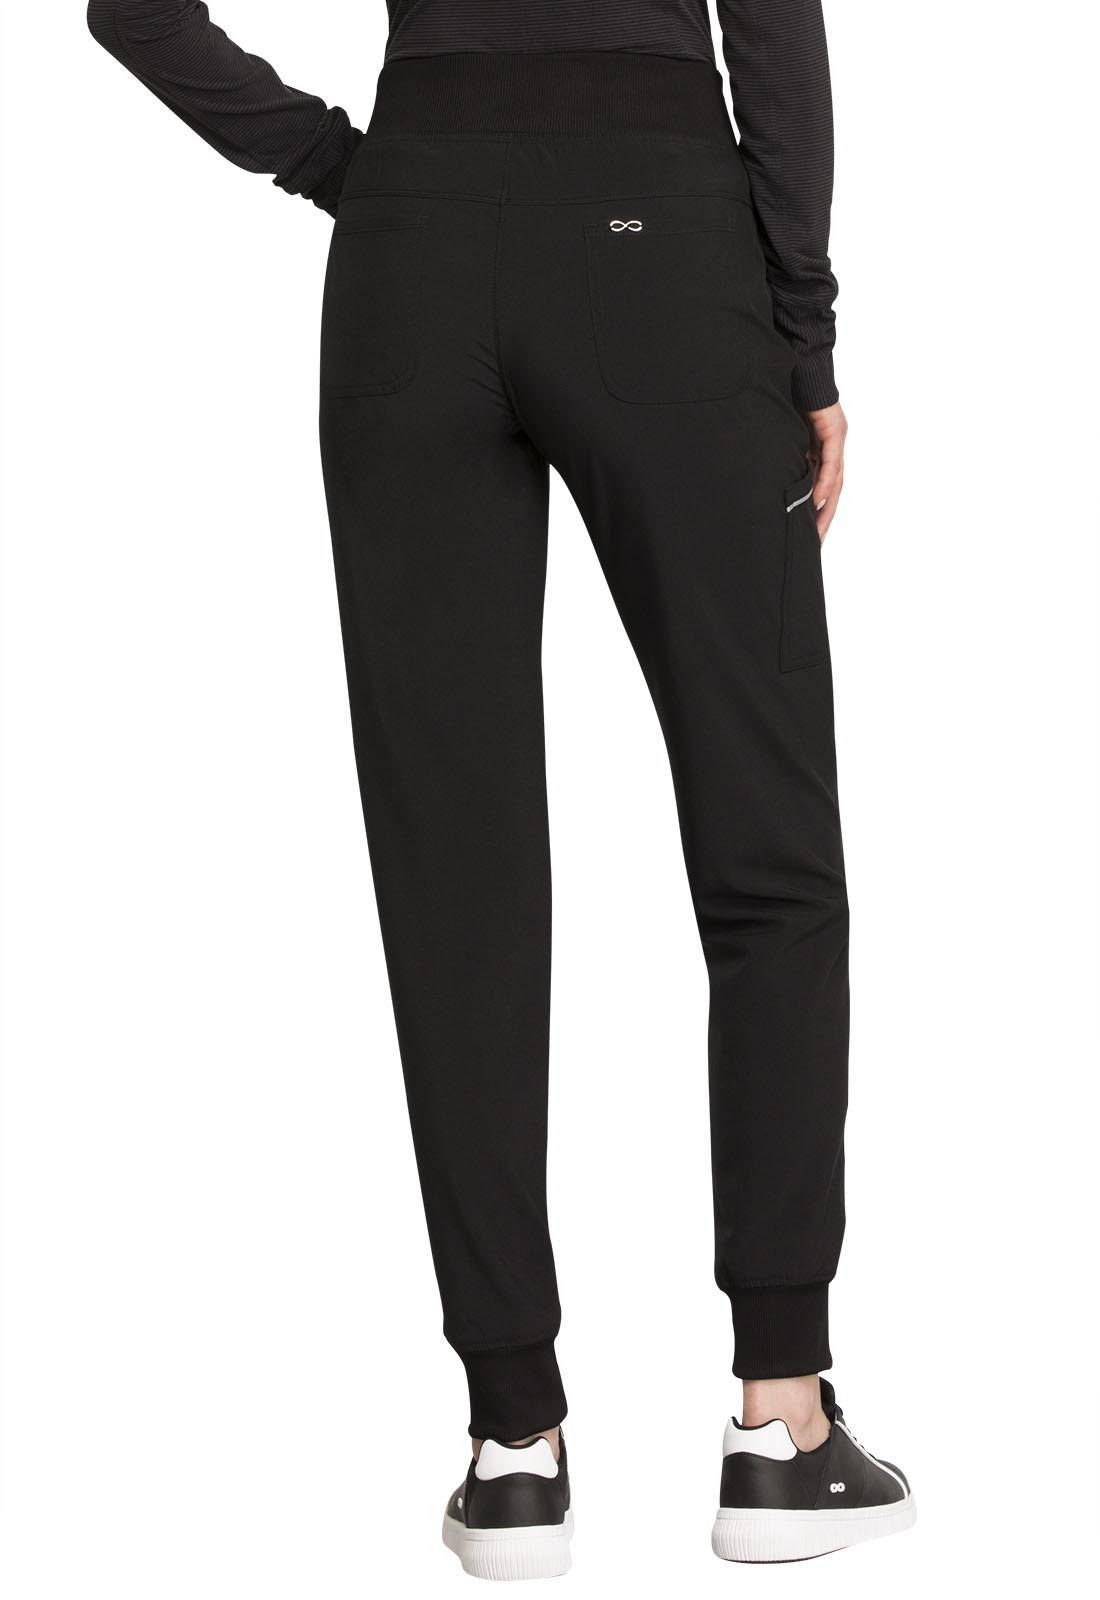 CHEROKEE Mid Rise Tall Women's Black Jogger Scrub Pants CK110AT-BAPS